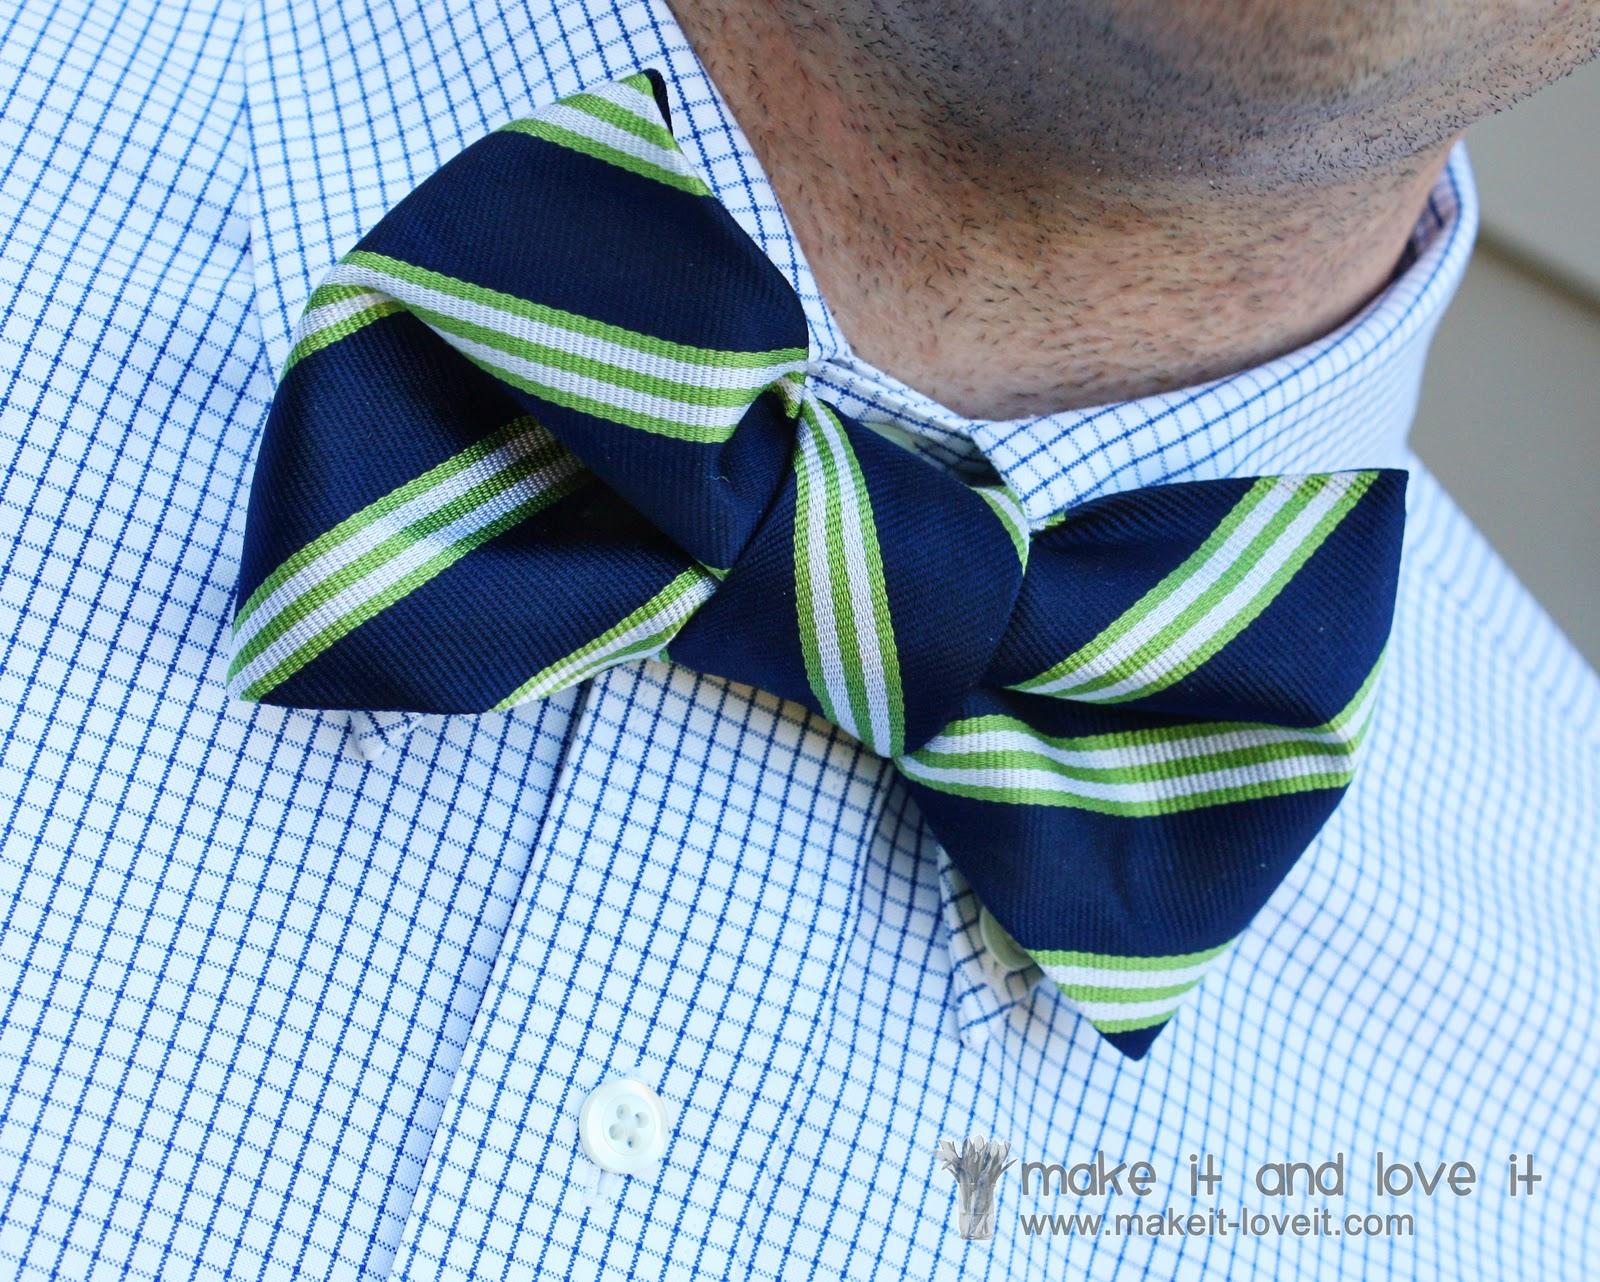 Repurposing: Neck Tie into Bow Tie | Make It and Love It